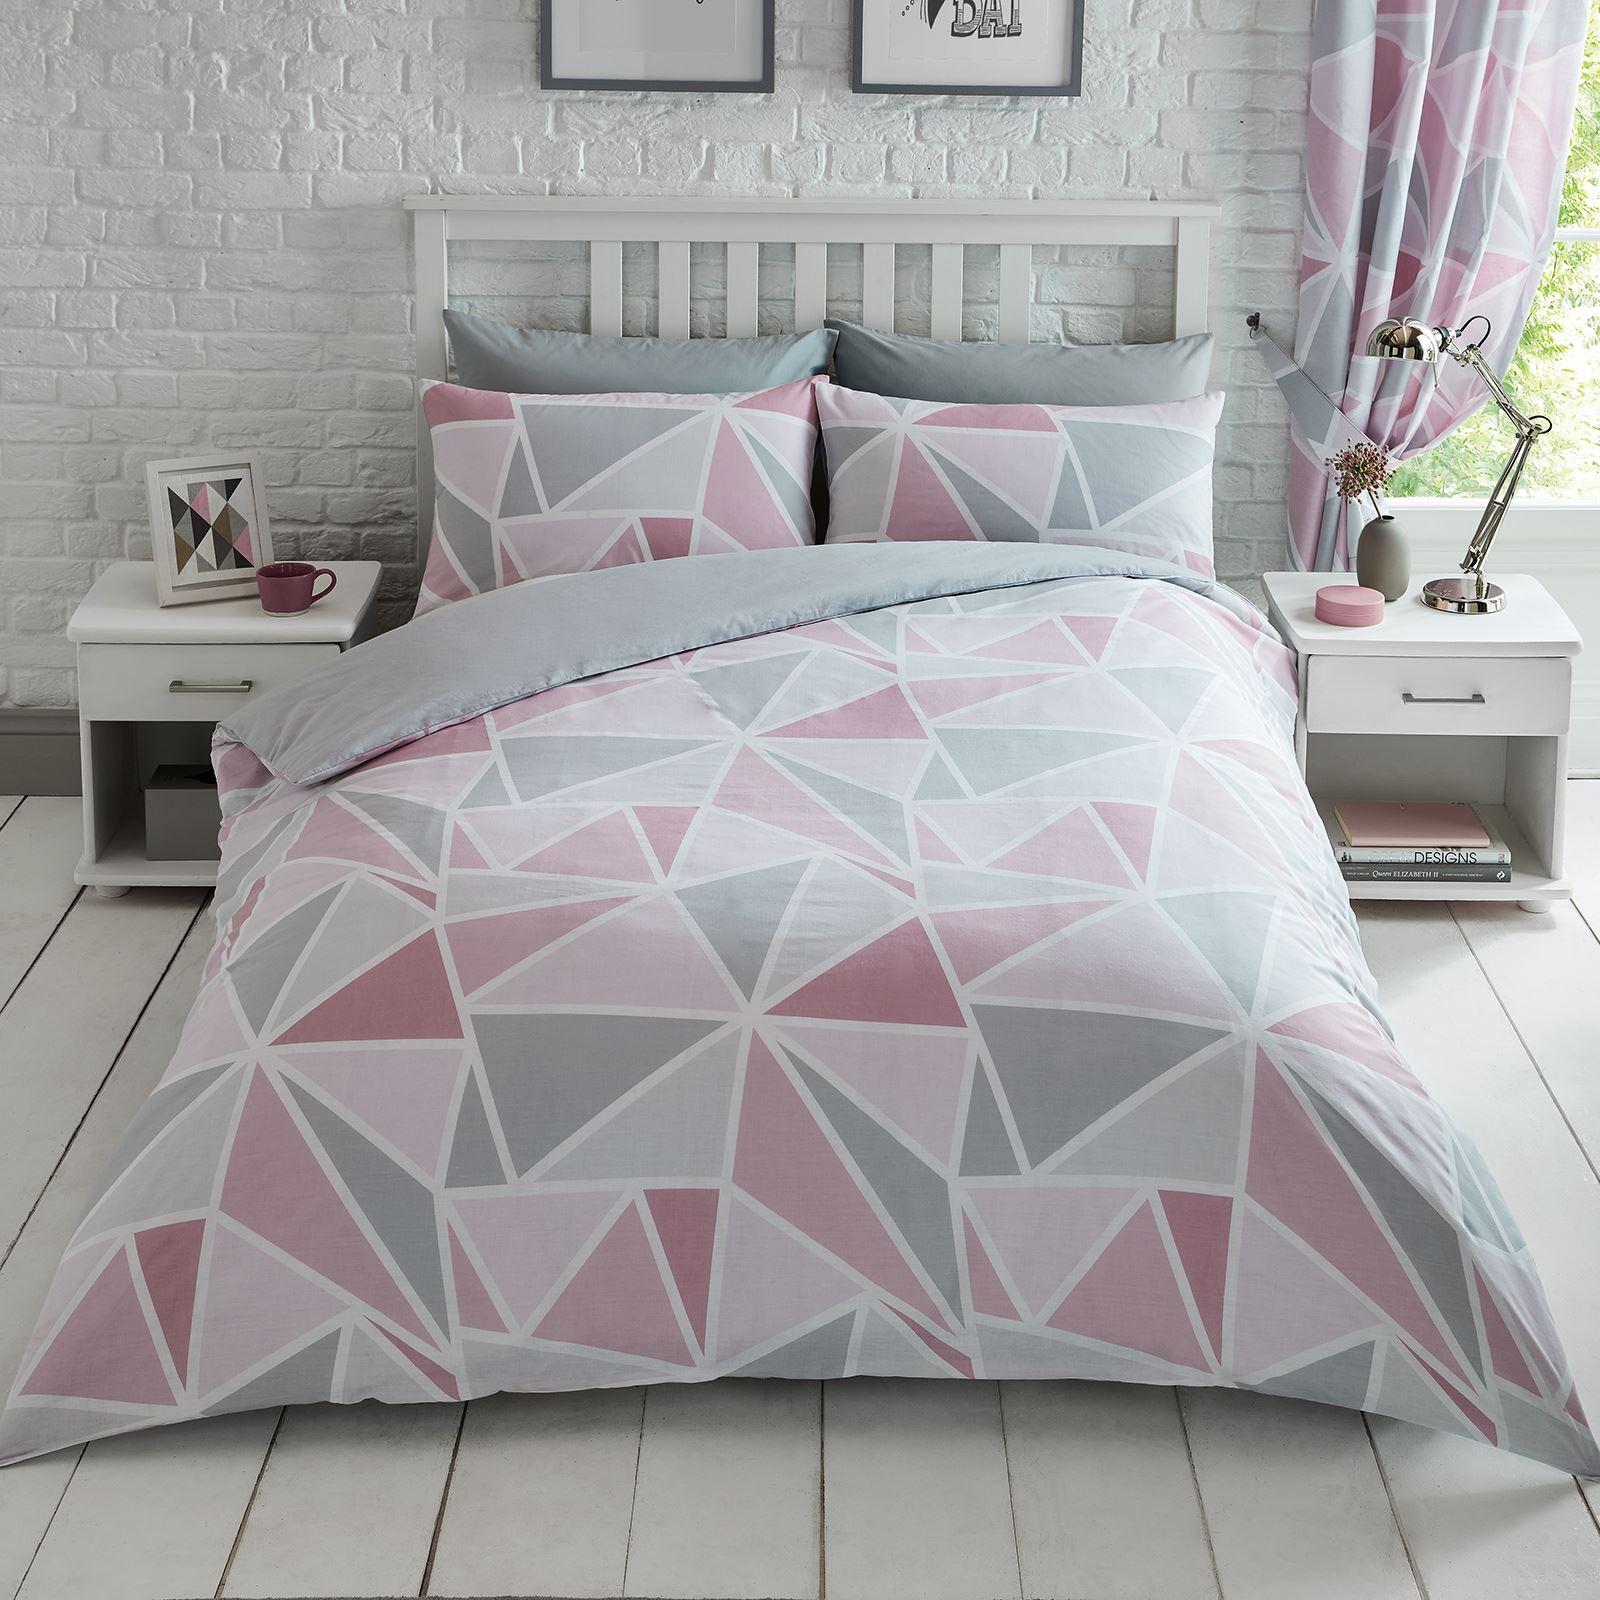 Metro Triangle Single Duvet Cover Set Pink Grey Modern Geometric